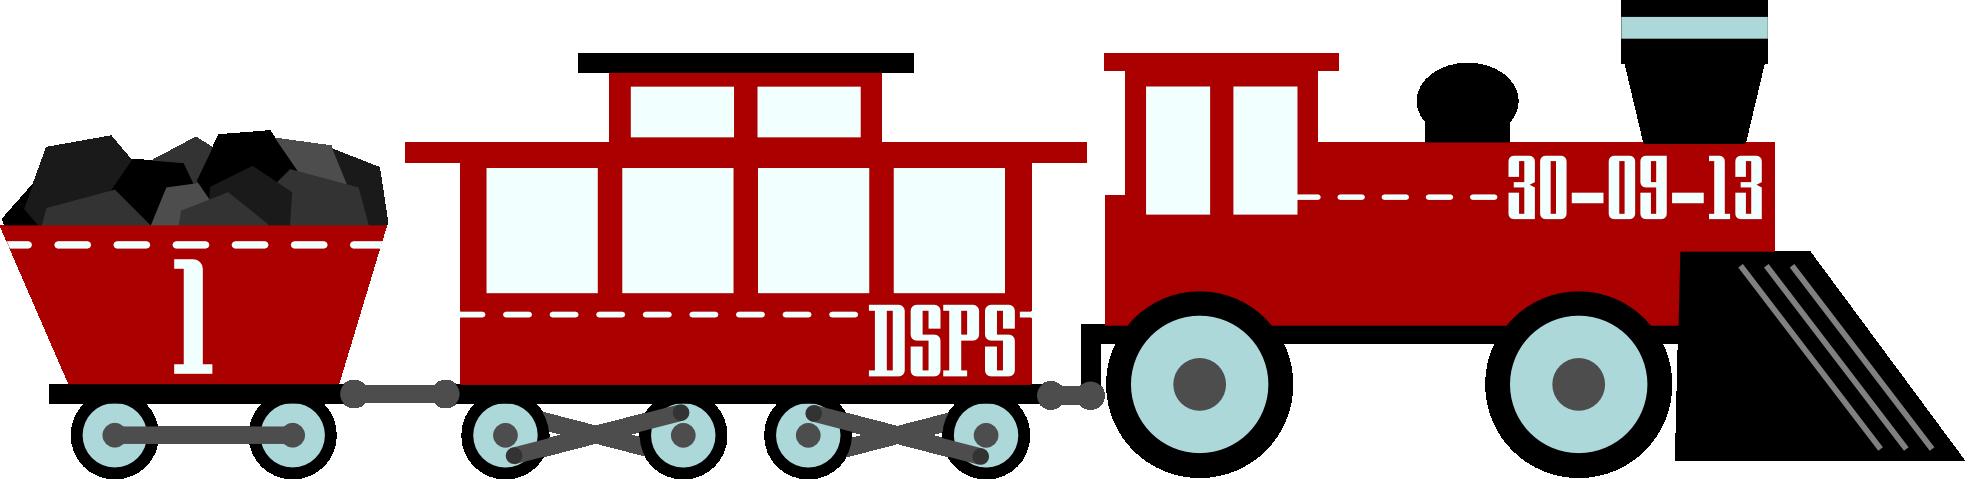 Clipart train mountain. Nursery google search silhouettes